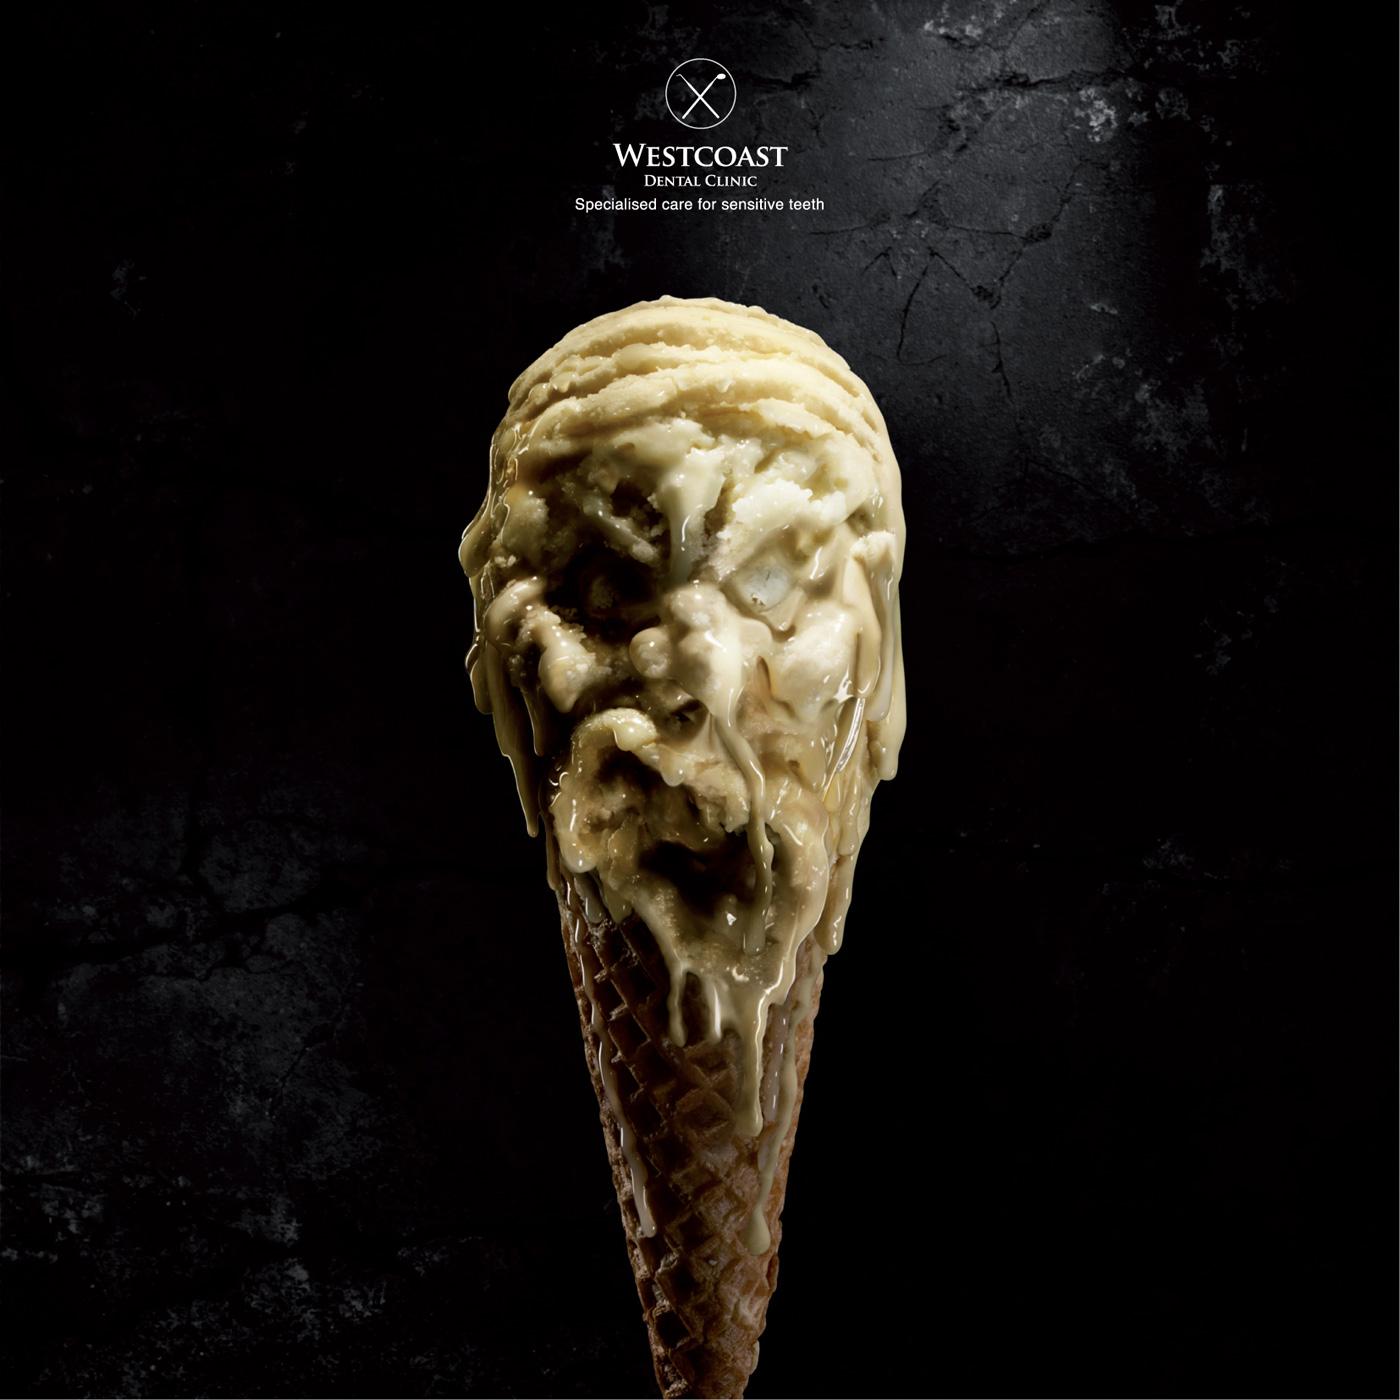 мороженое, реклама